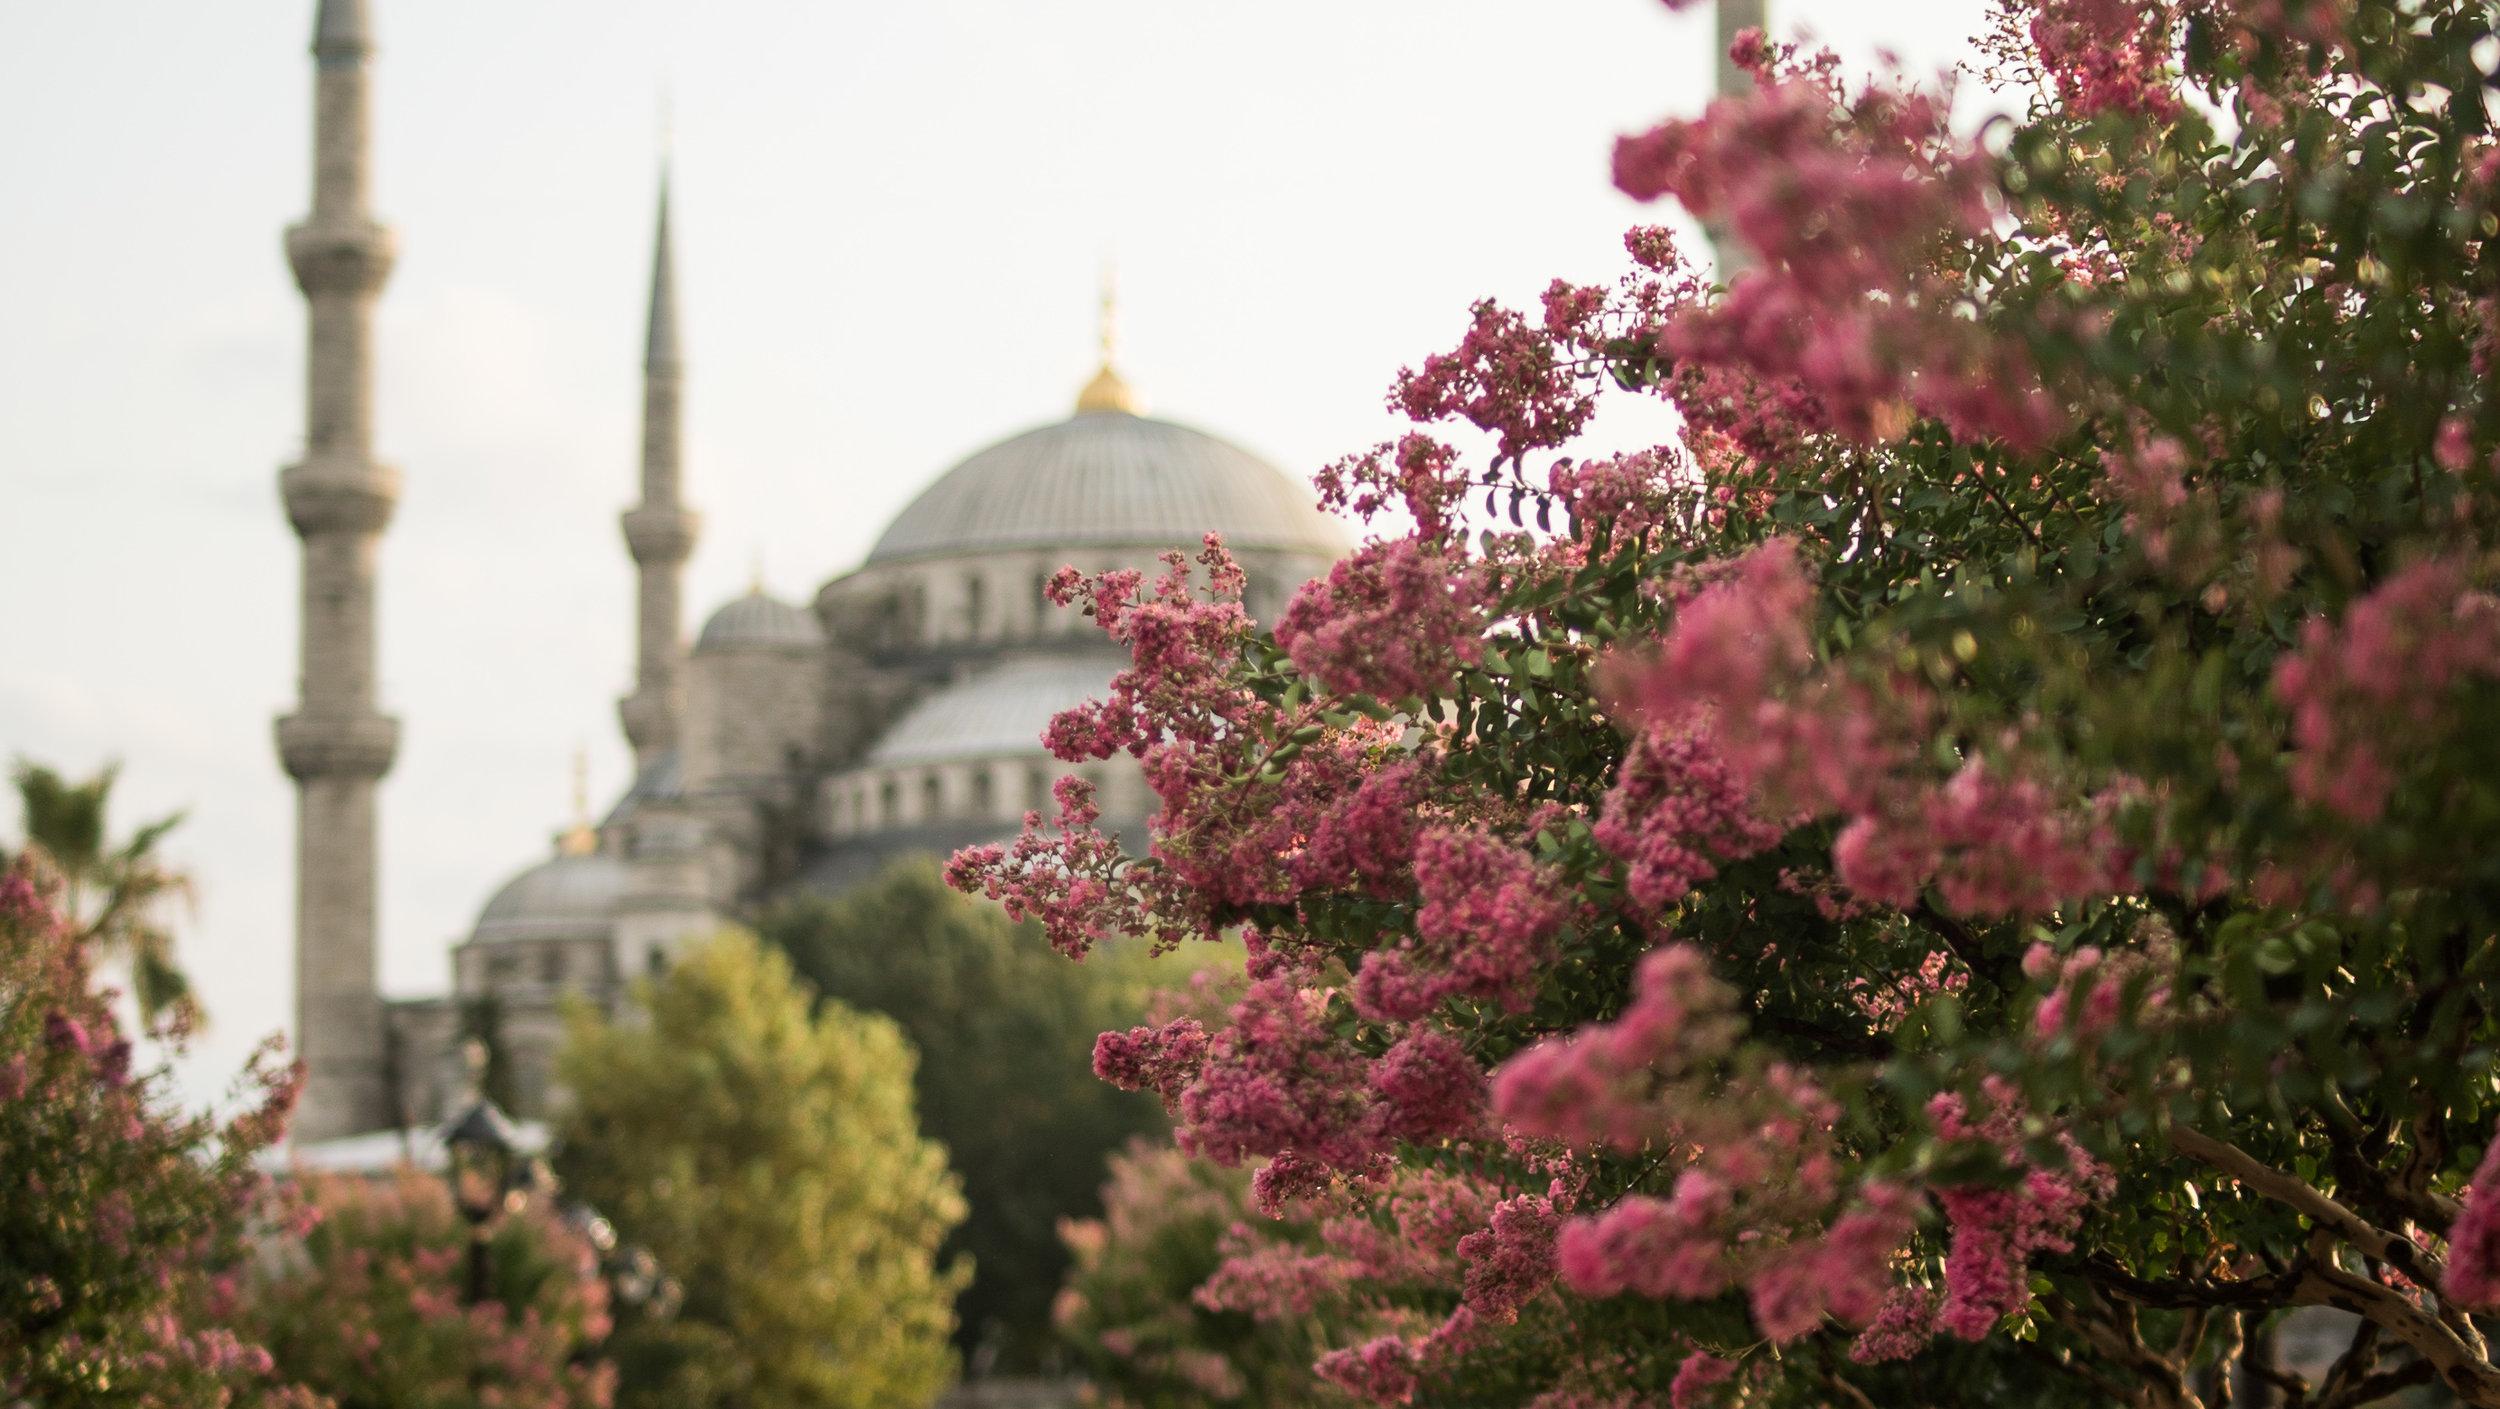 turkey-01789.jpg